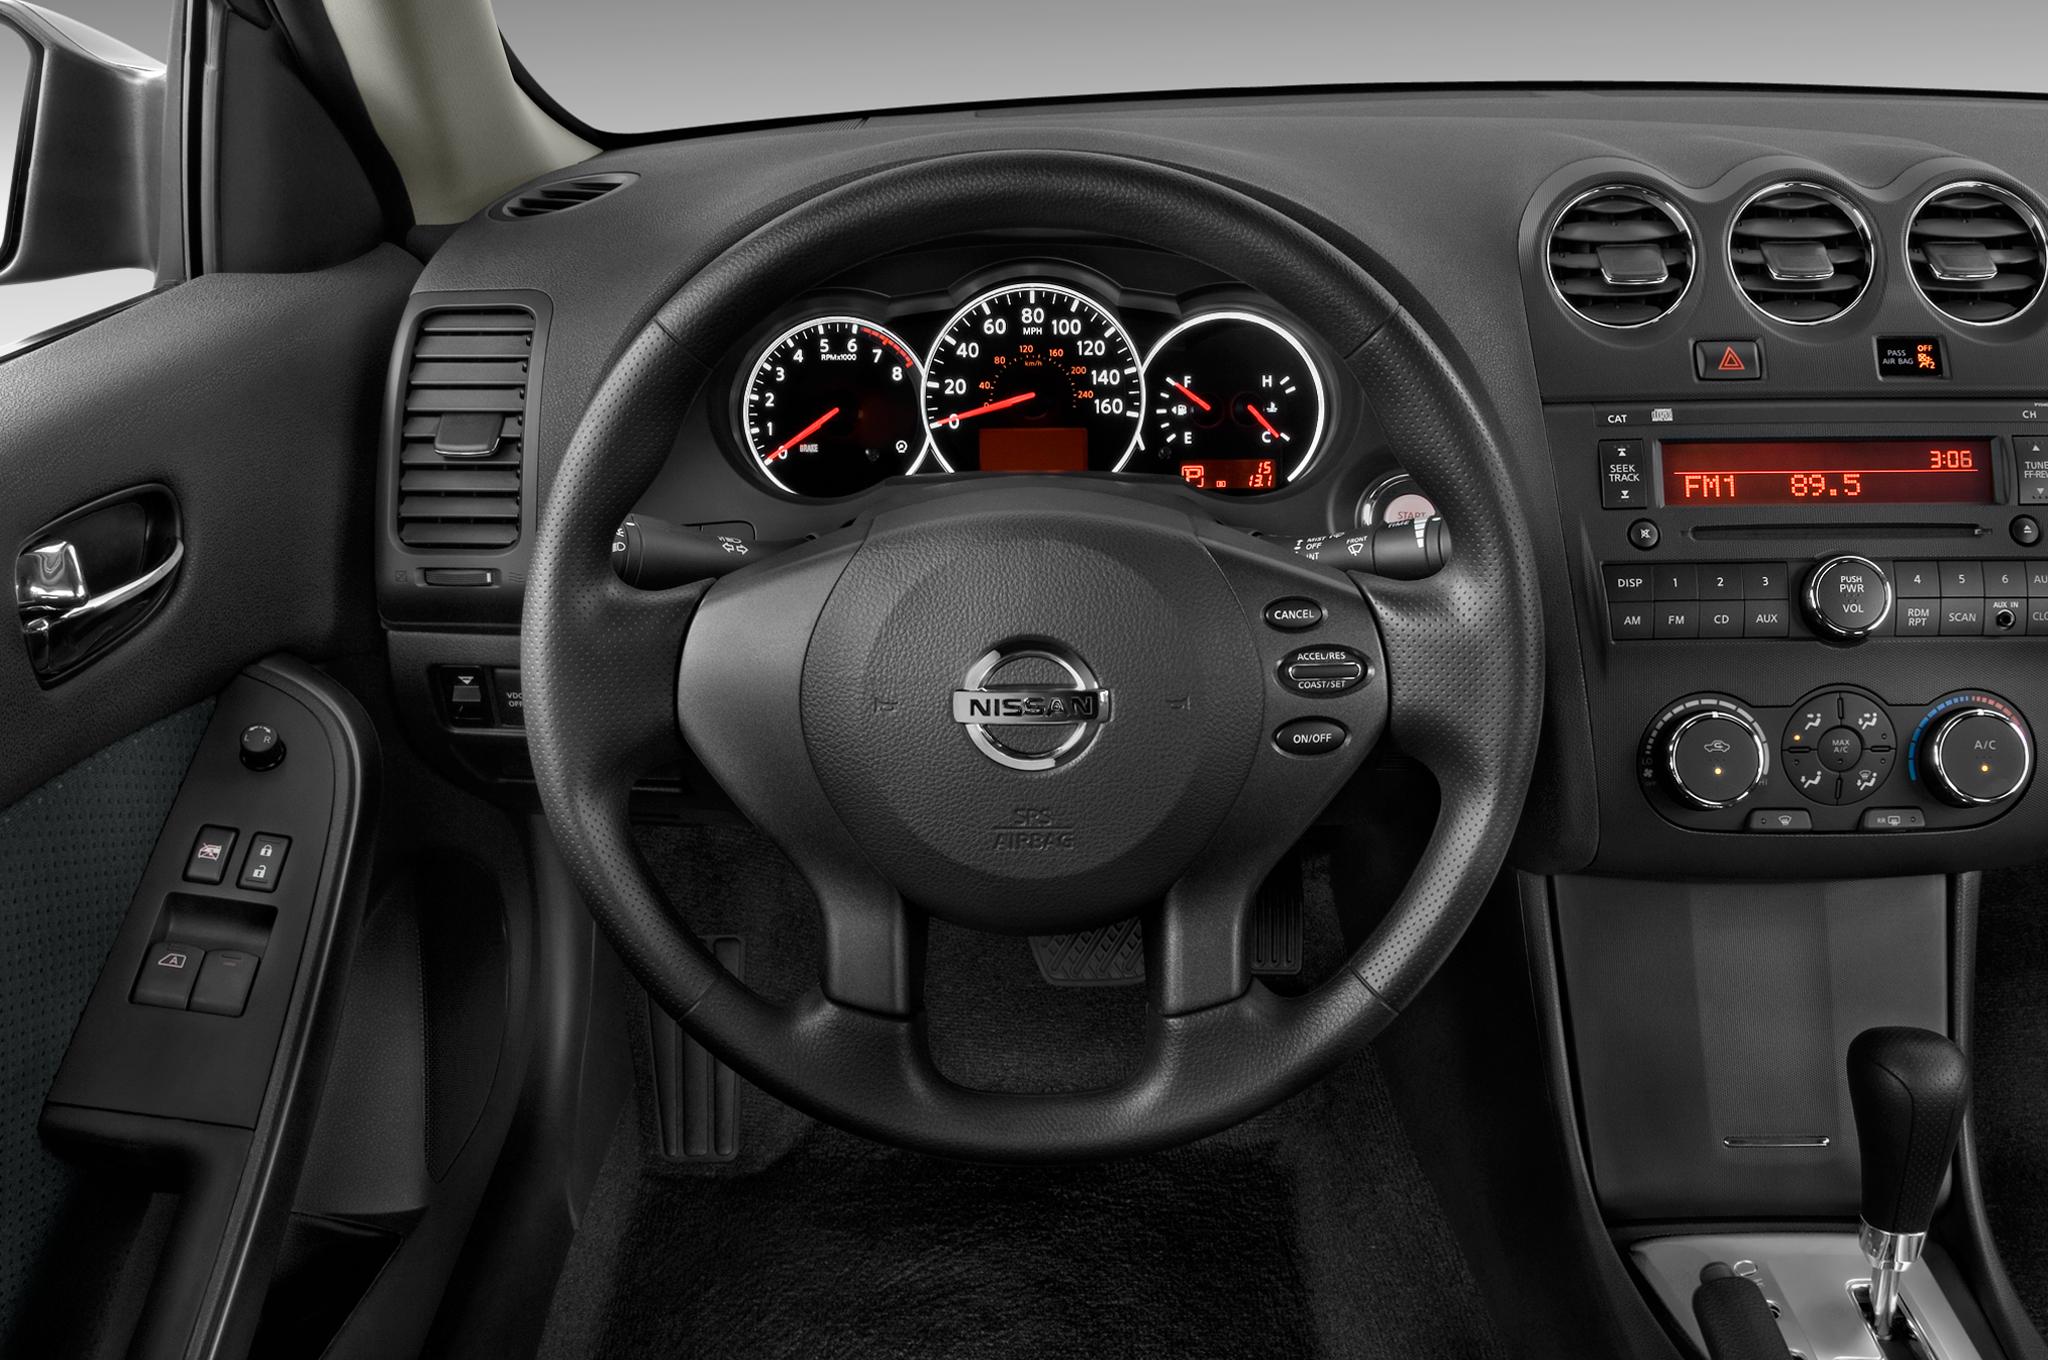 Nissan Altima 2 5s >> 2012 Nissan Altima 2.5S - Editors' Notebook - Automobile ...